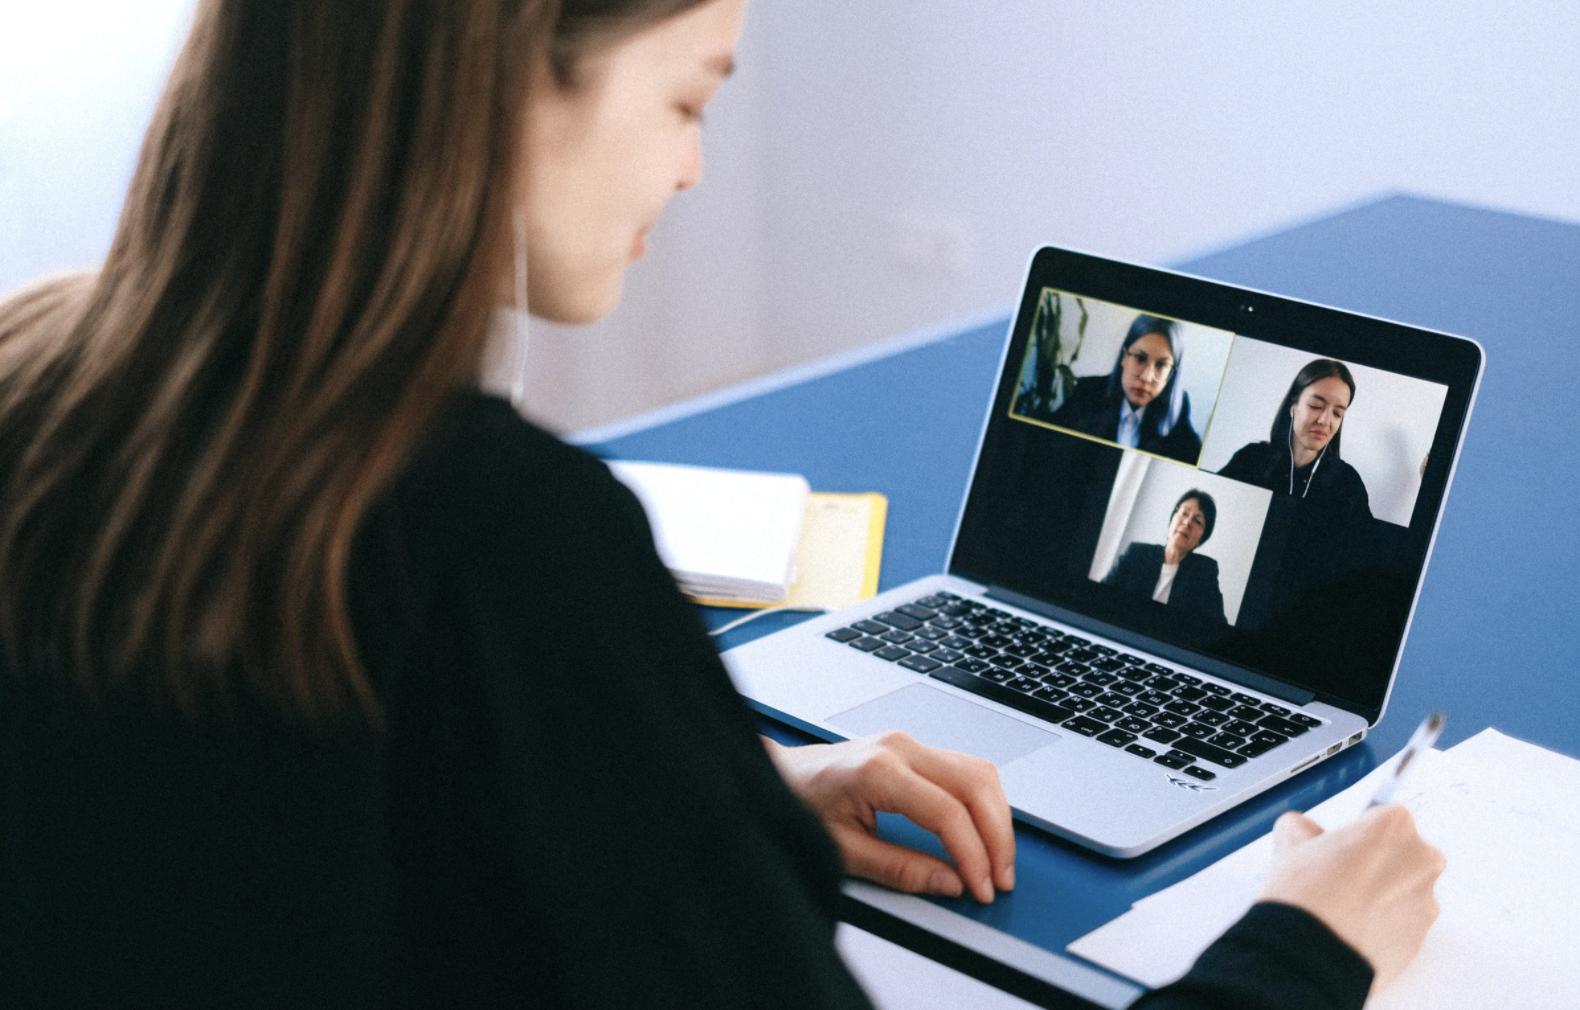 Women on video call